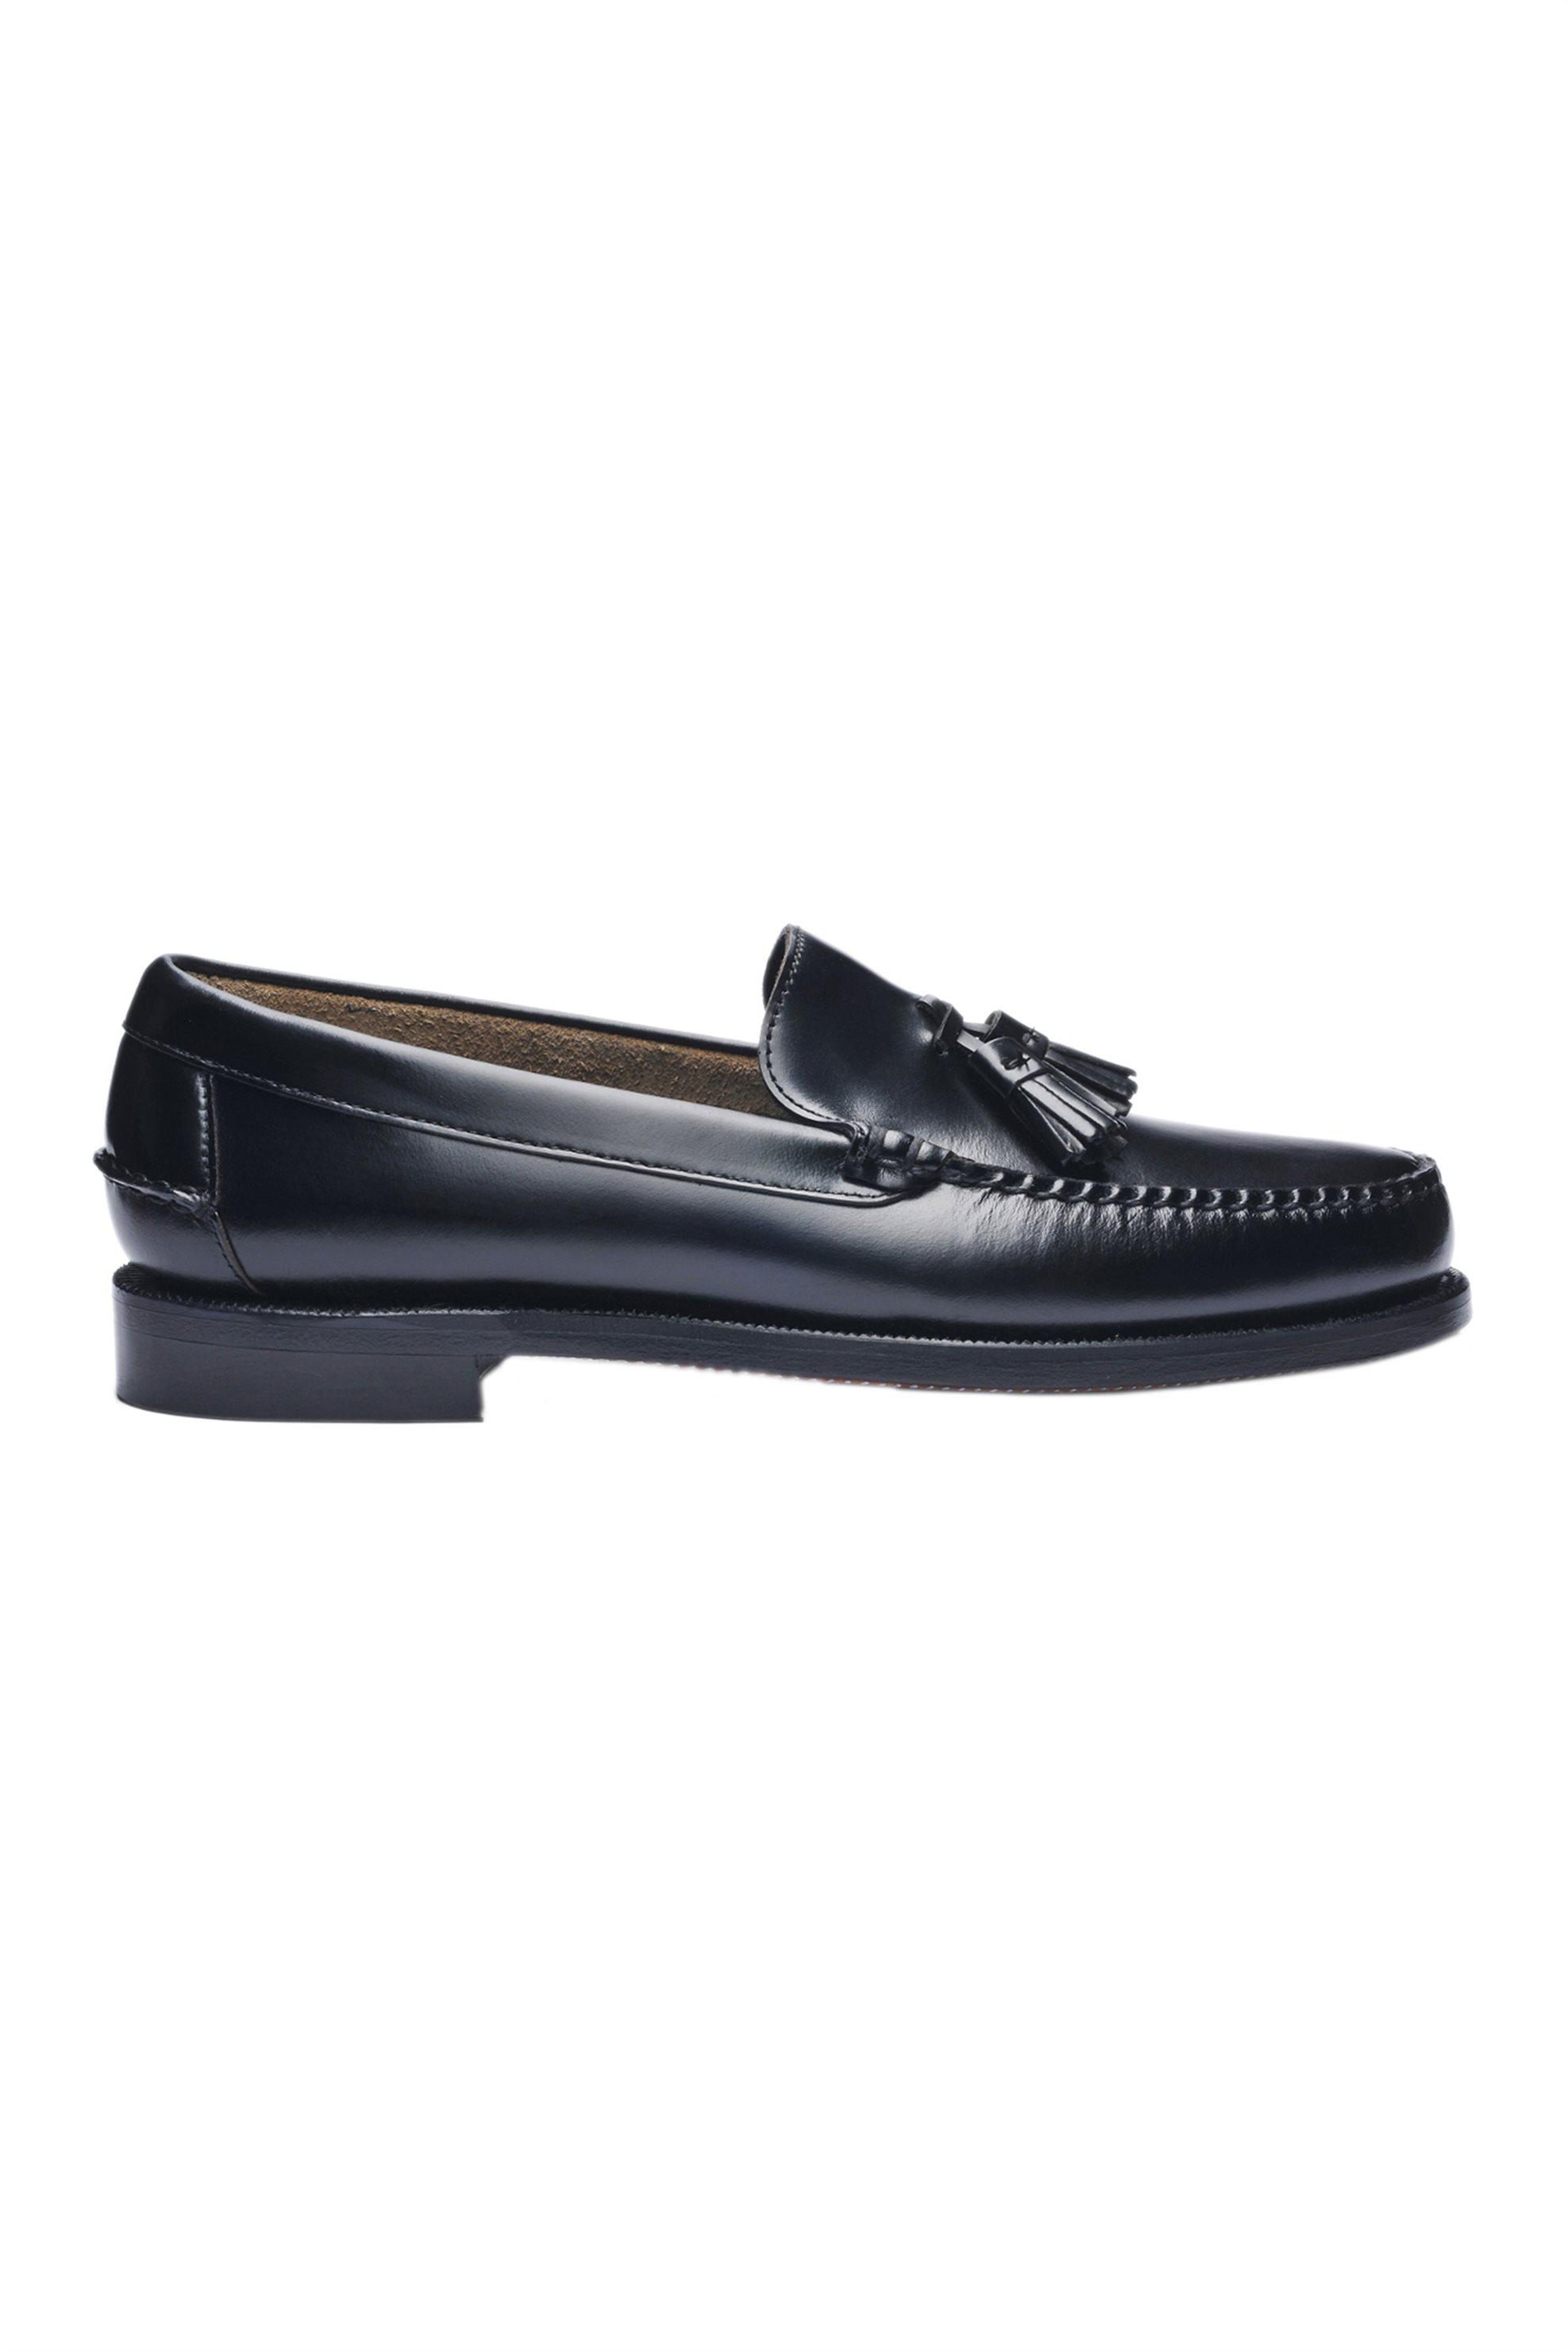 "Sebago® ανδρικά loafers με φουντάκια ""Classic Will"" – L7001R20-902W – Μαύρο"